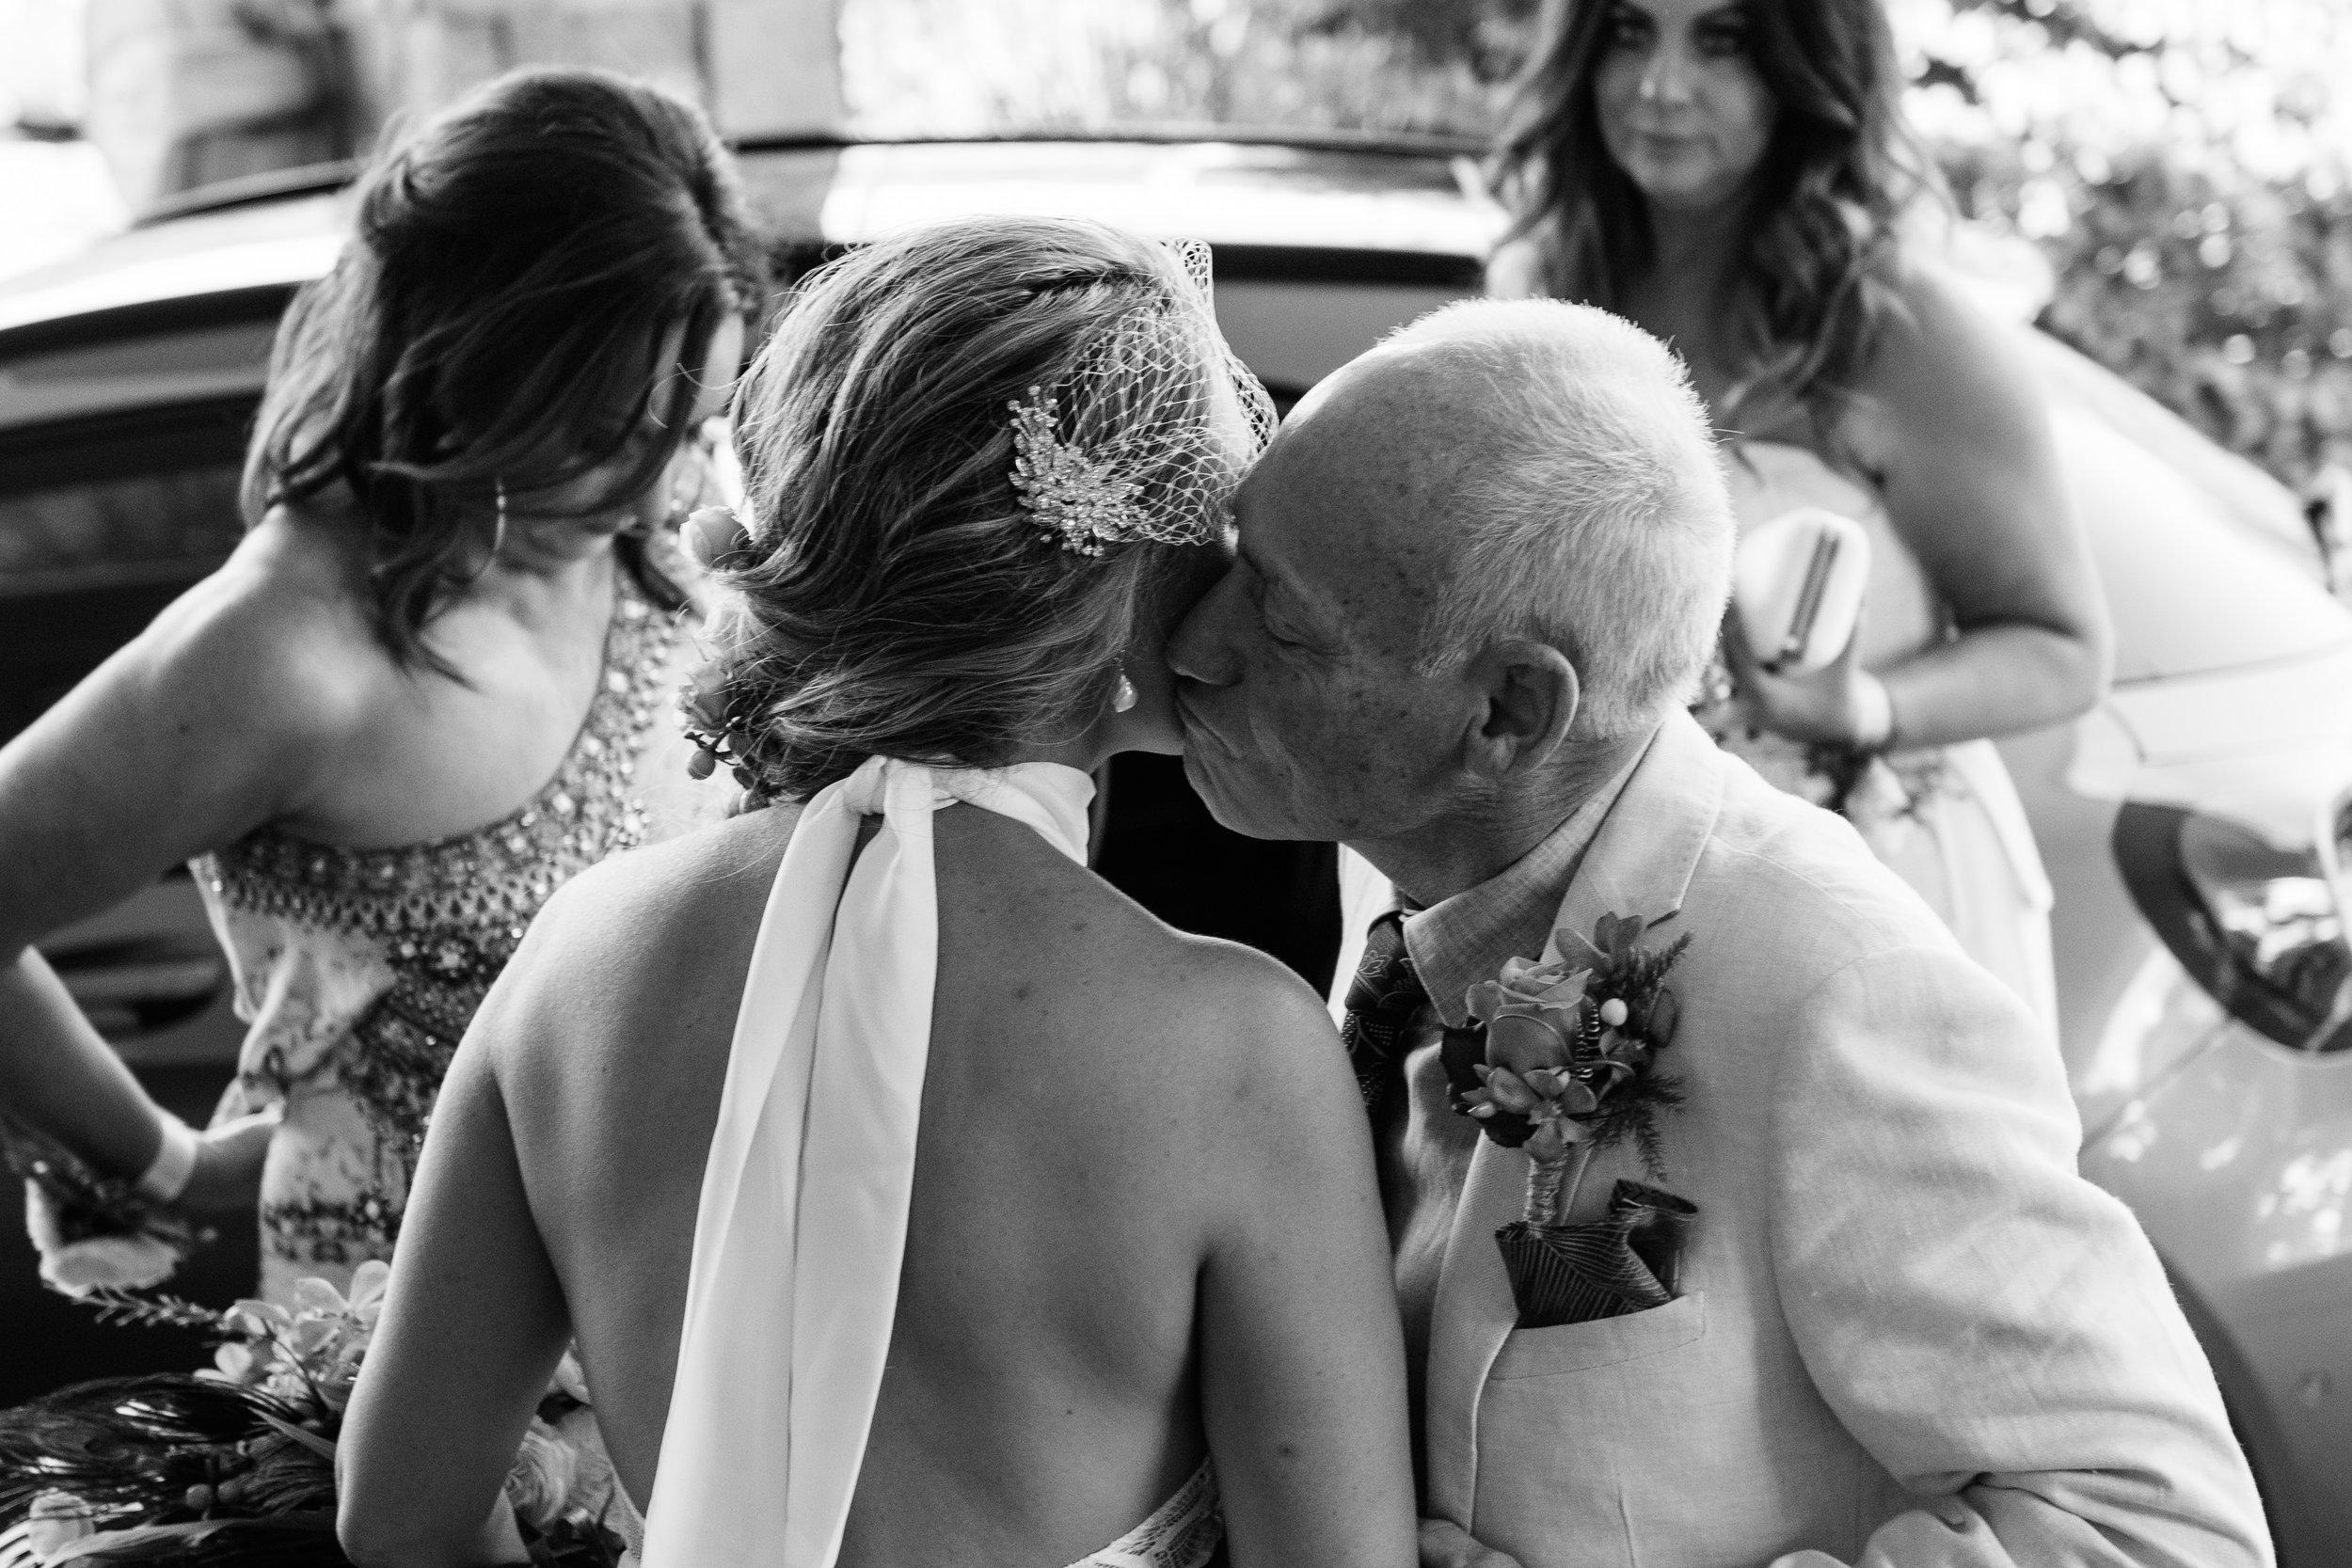 leah and cliff- skyla sage photography   wedding photographer, byron bay wedding and family photographer, tweed heads wedding and family photography-52.jpg